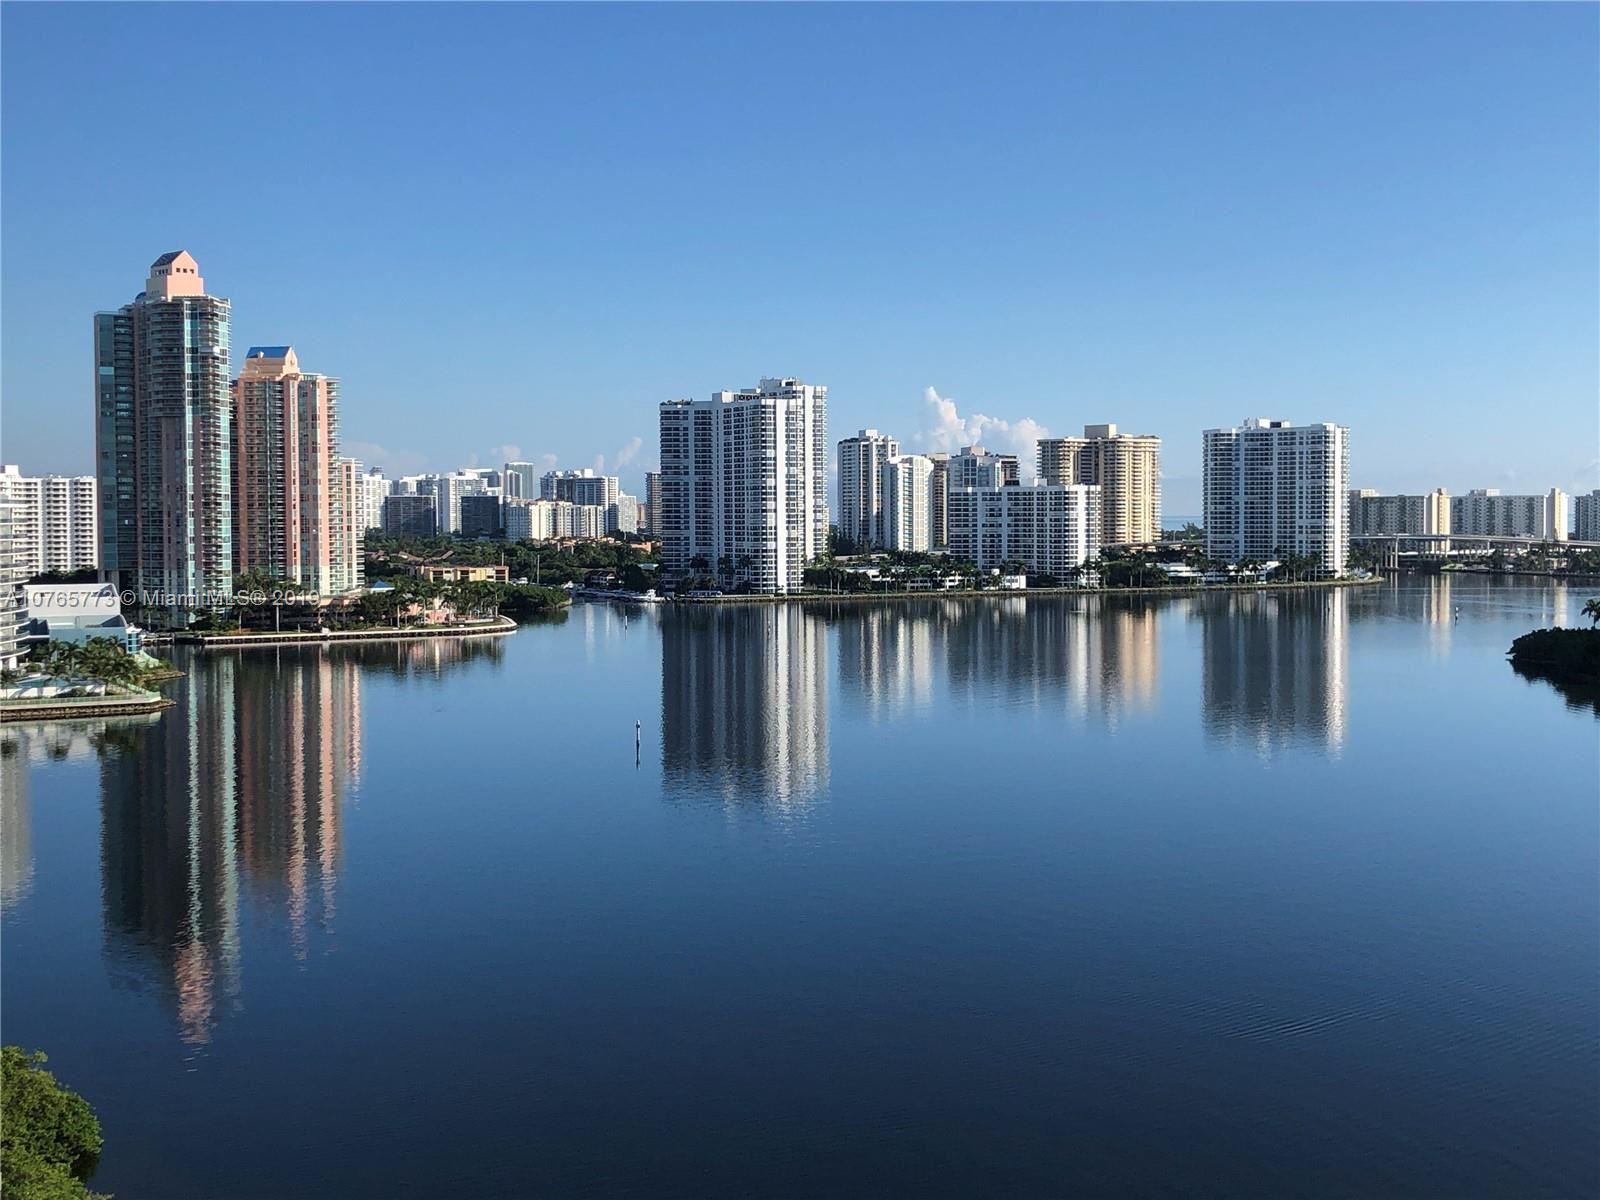 7000 Island Blvd #1407, Aventura, FL 33160 - #: A10765773